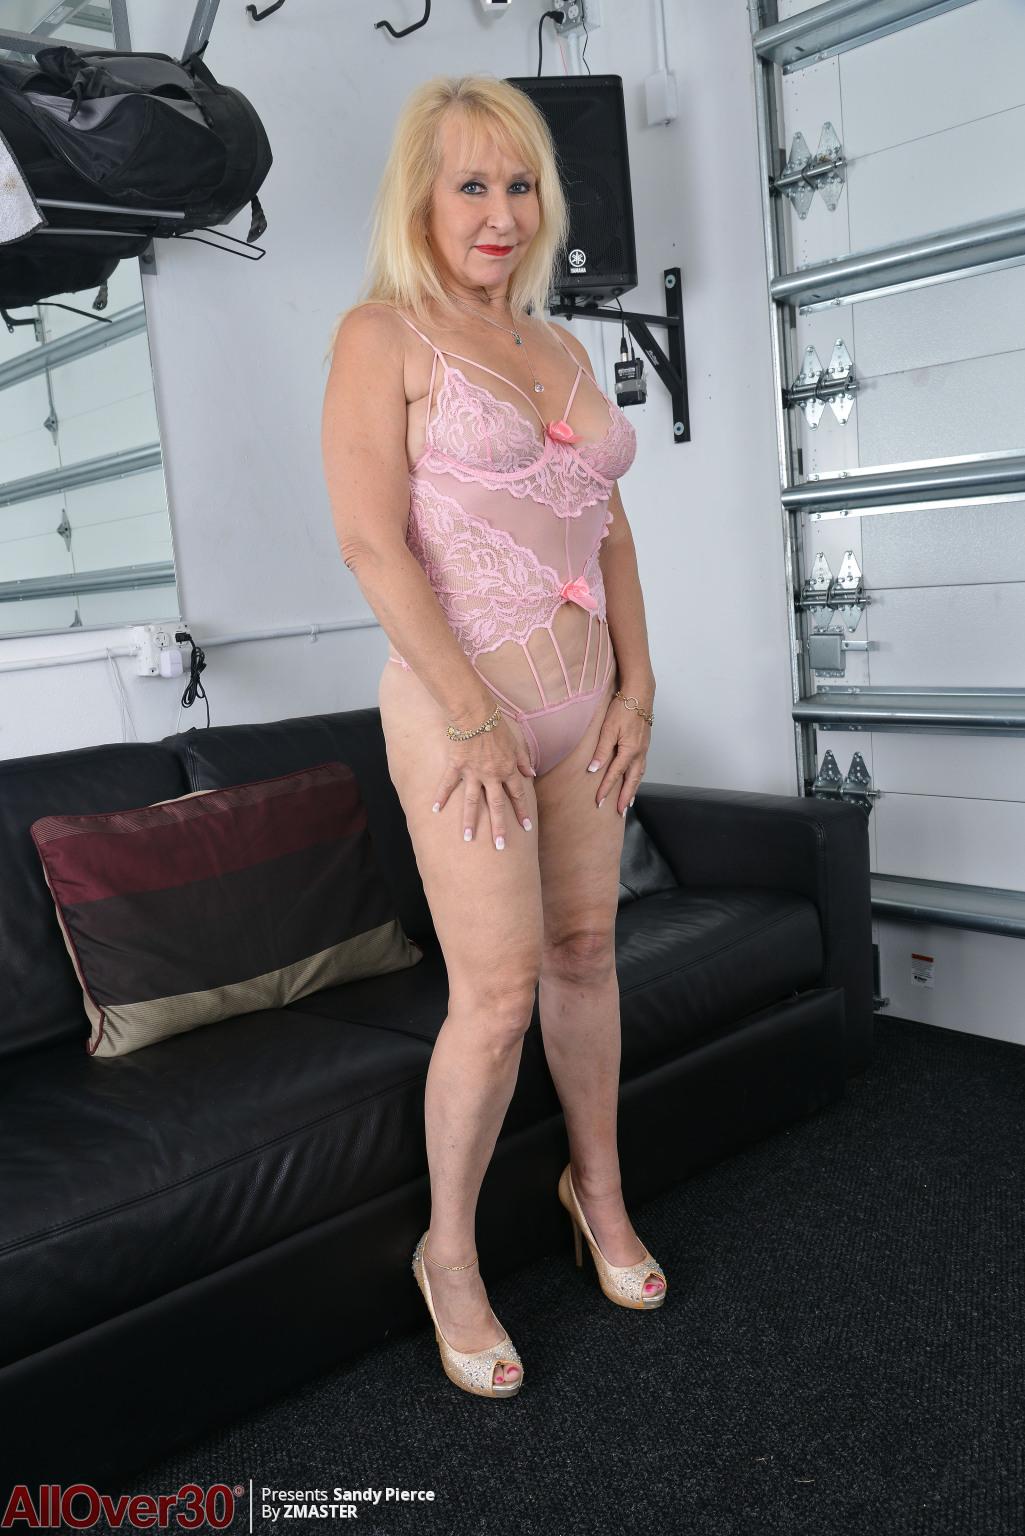 Sandy Pierce from AllOver30